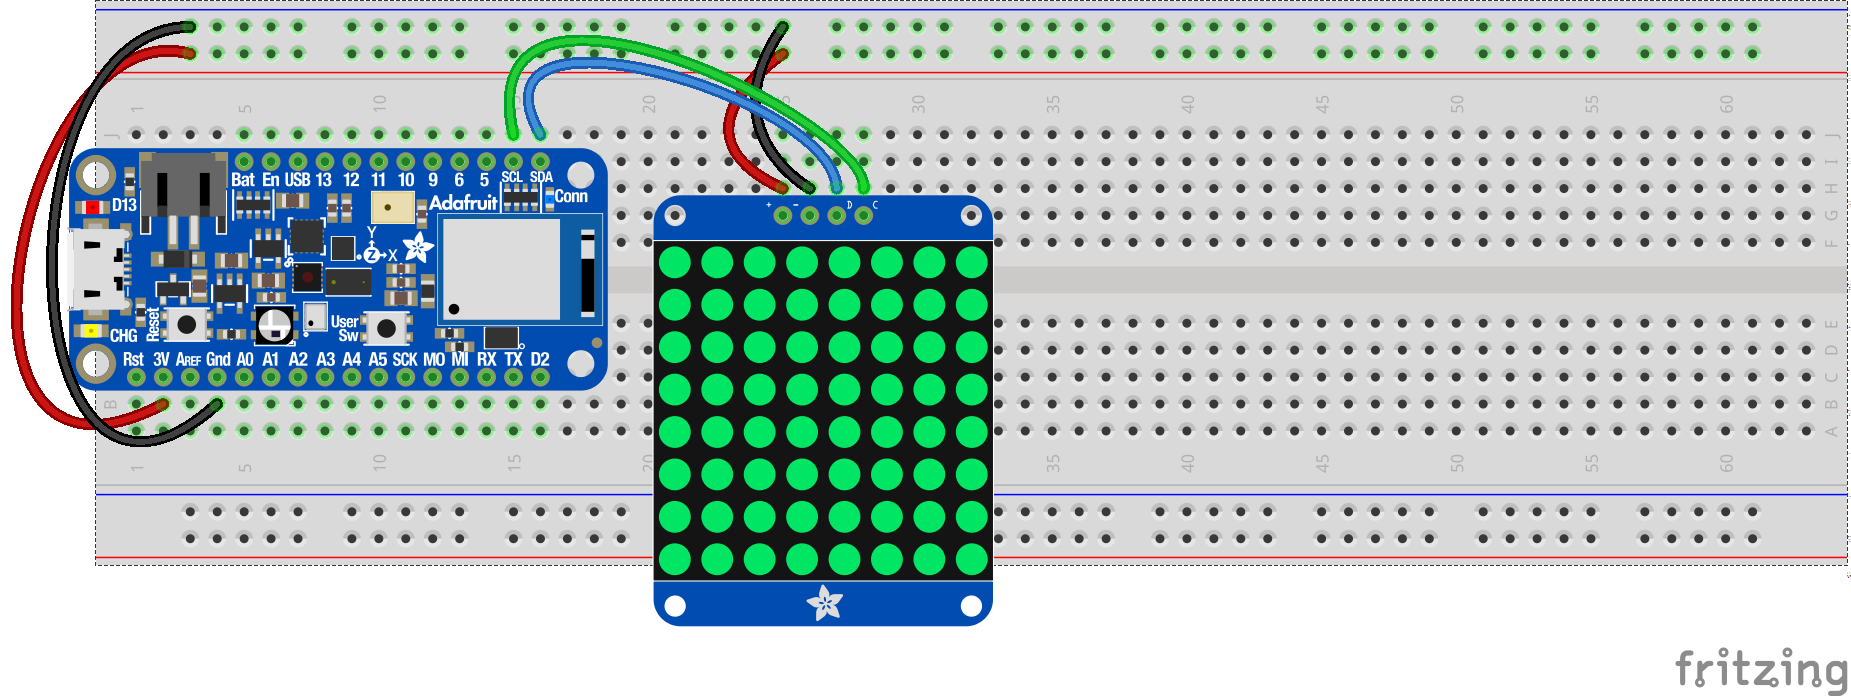 led_matrices_single_matrix_bb.png